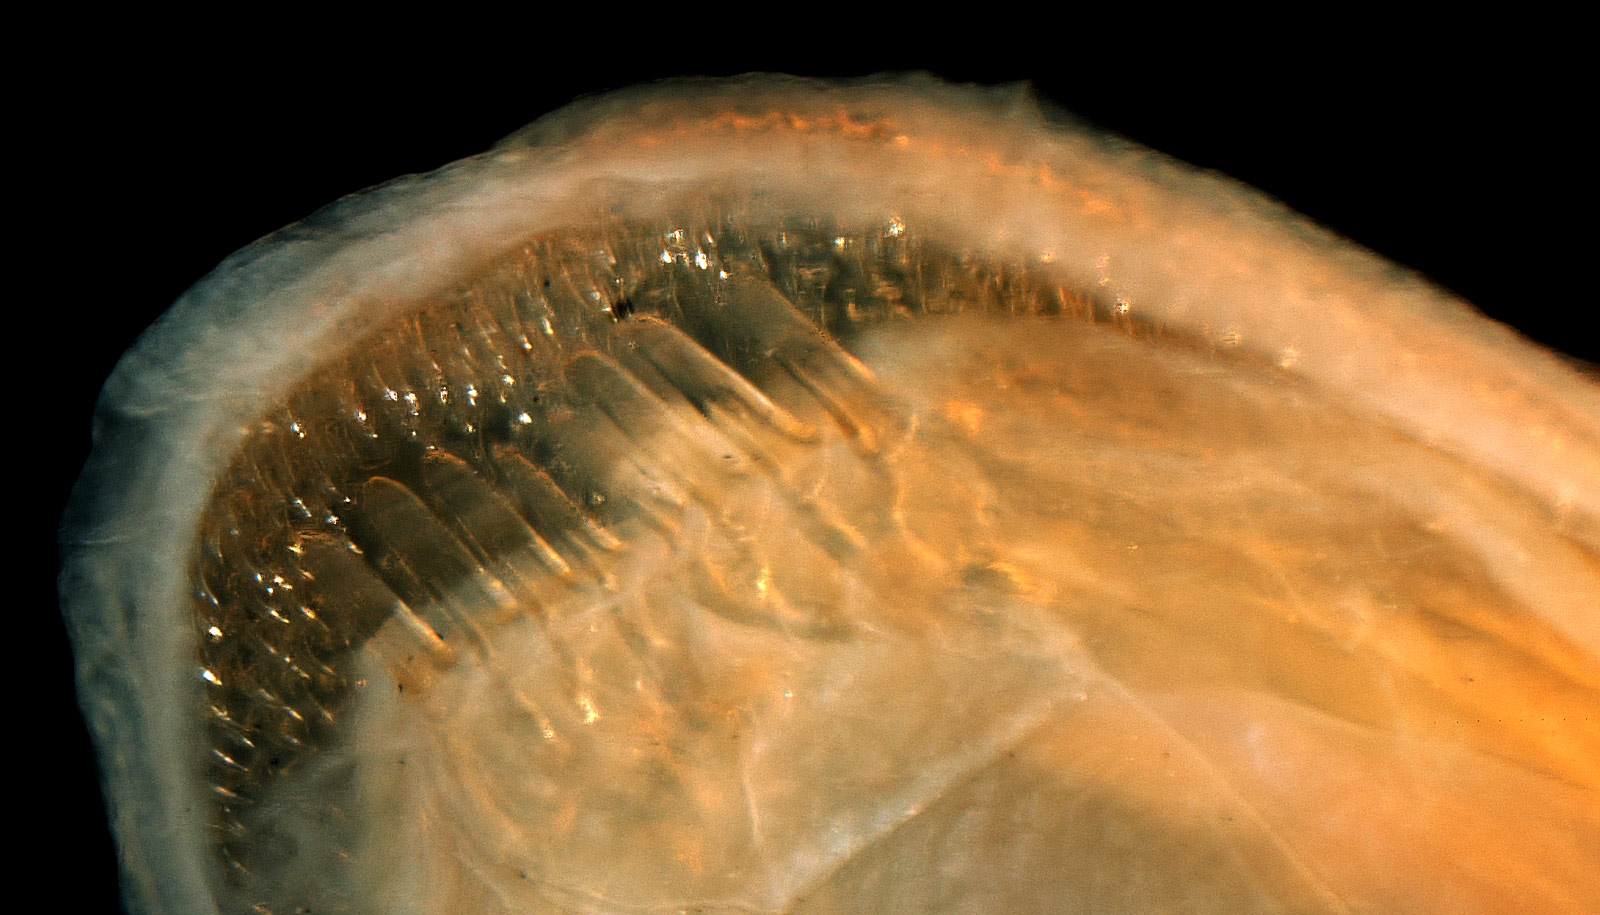 teeth close-up